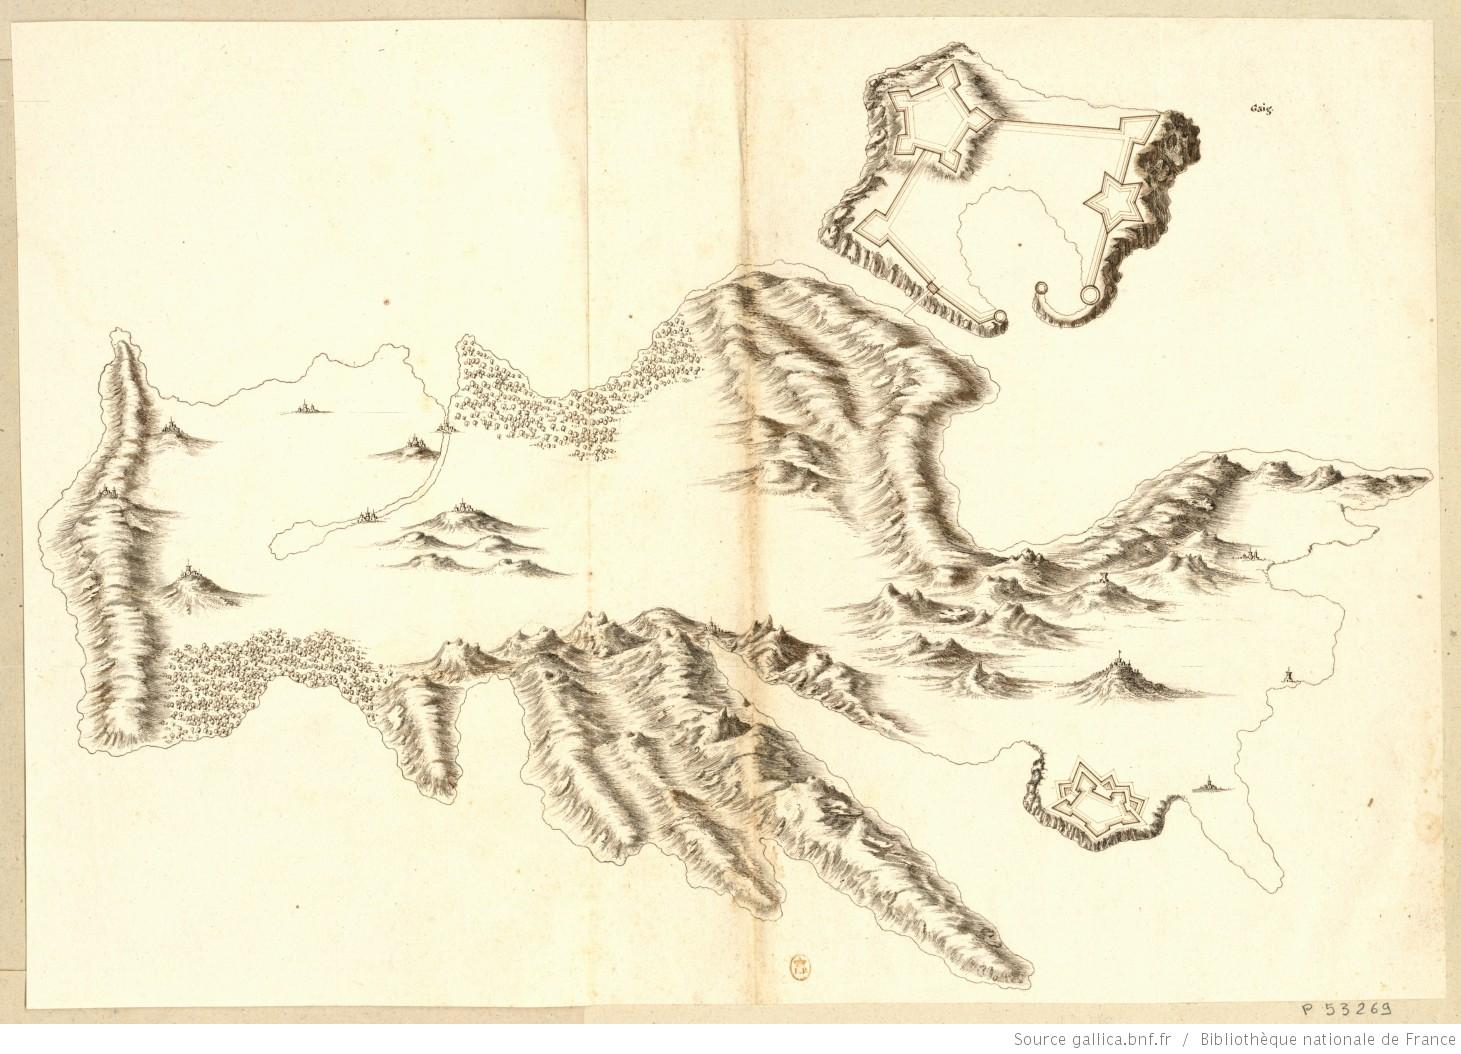 Mappa napoleonica dell'isola d'Elba